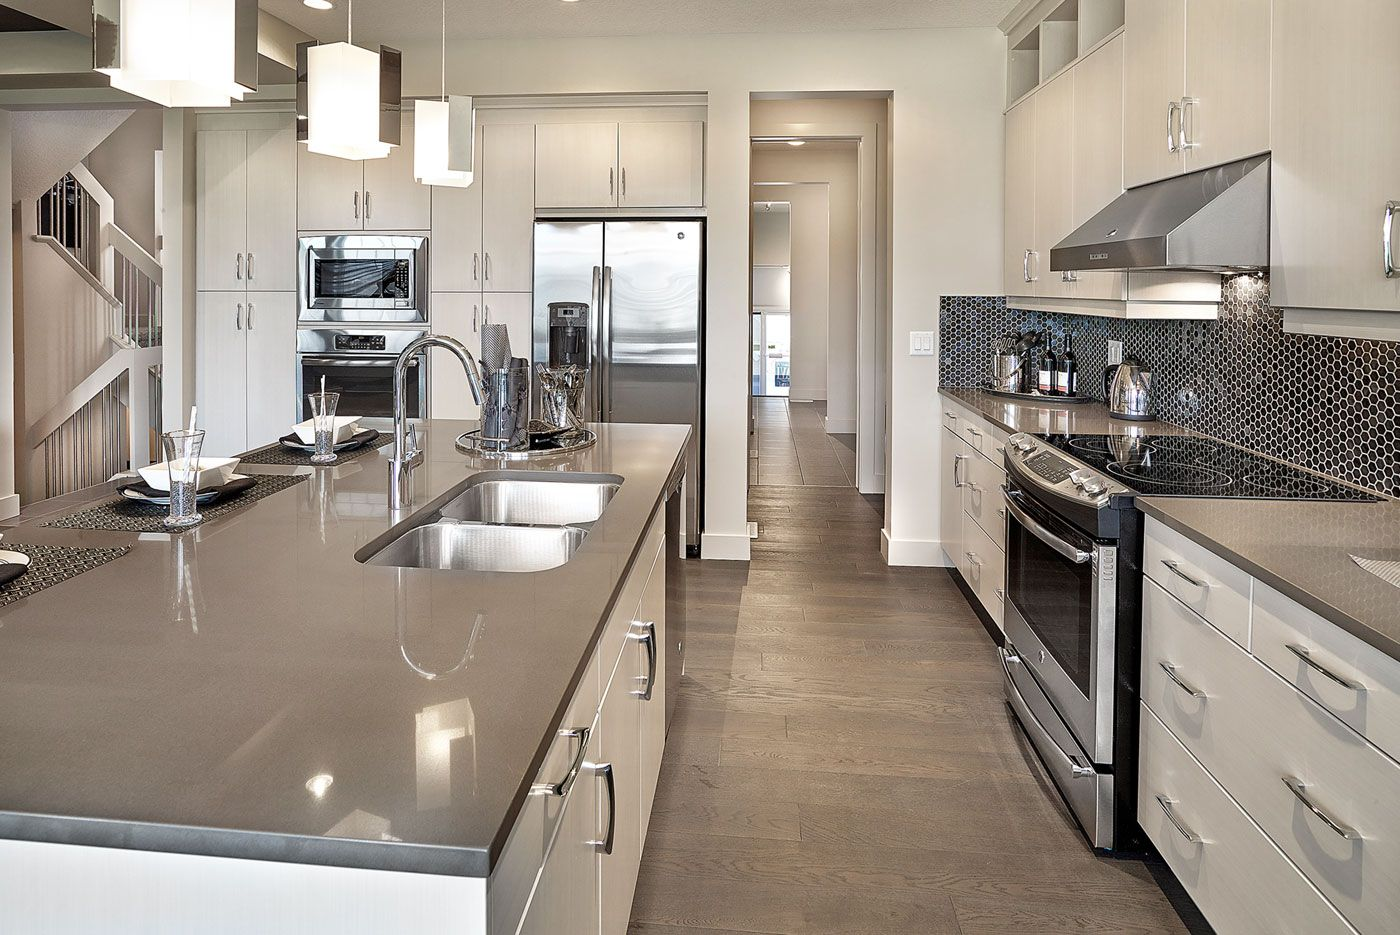 Rosedale Superior Cabinets Contemporary Kitchen Best Kitchen